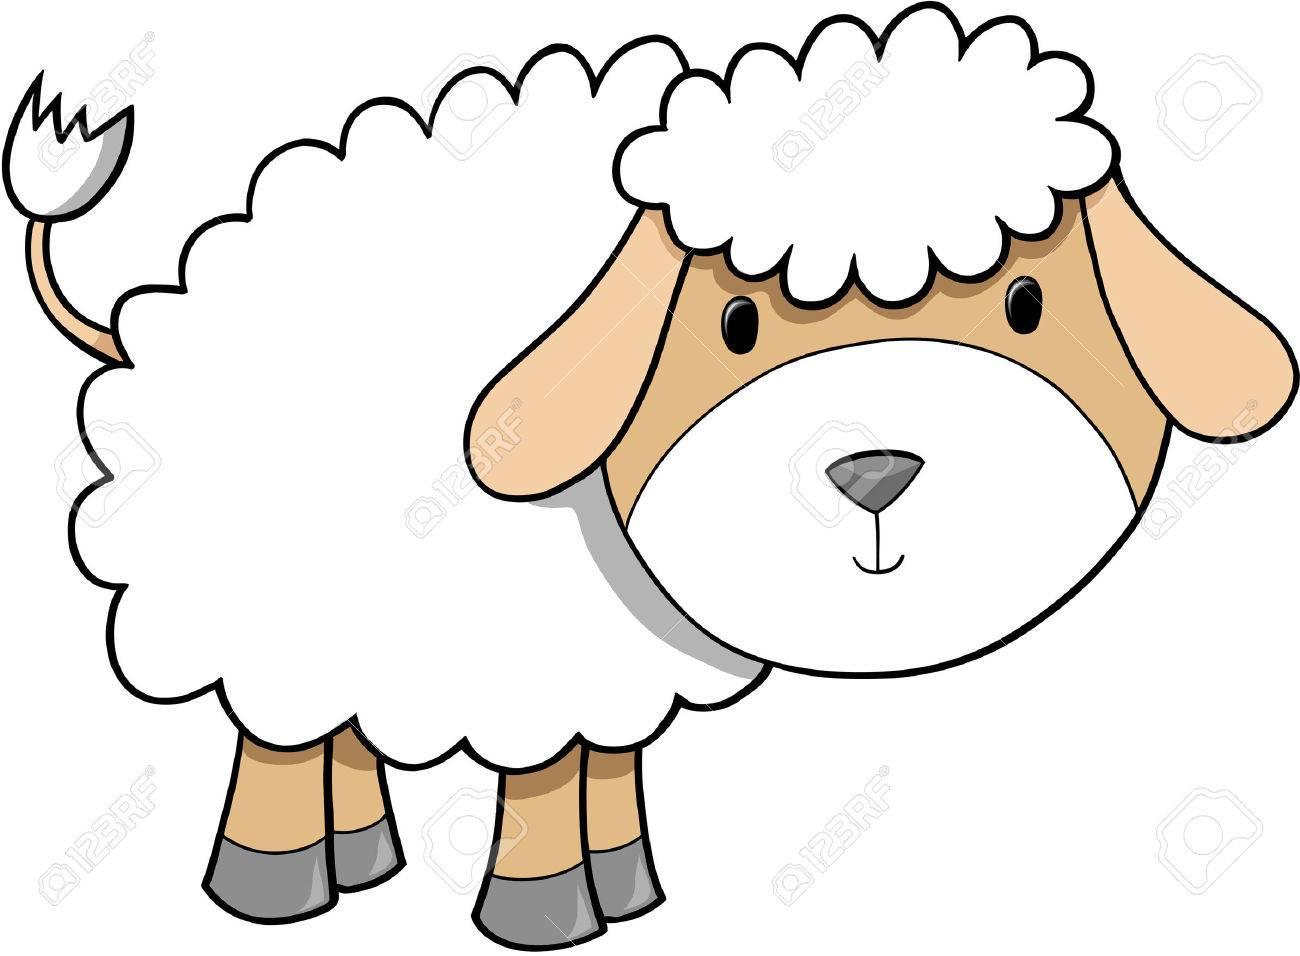 Sheep Lamb Vector Illustration Stock Vector - 2408637